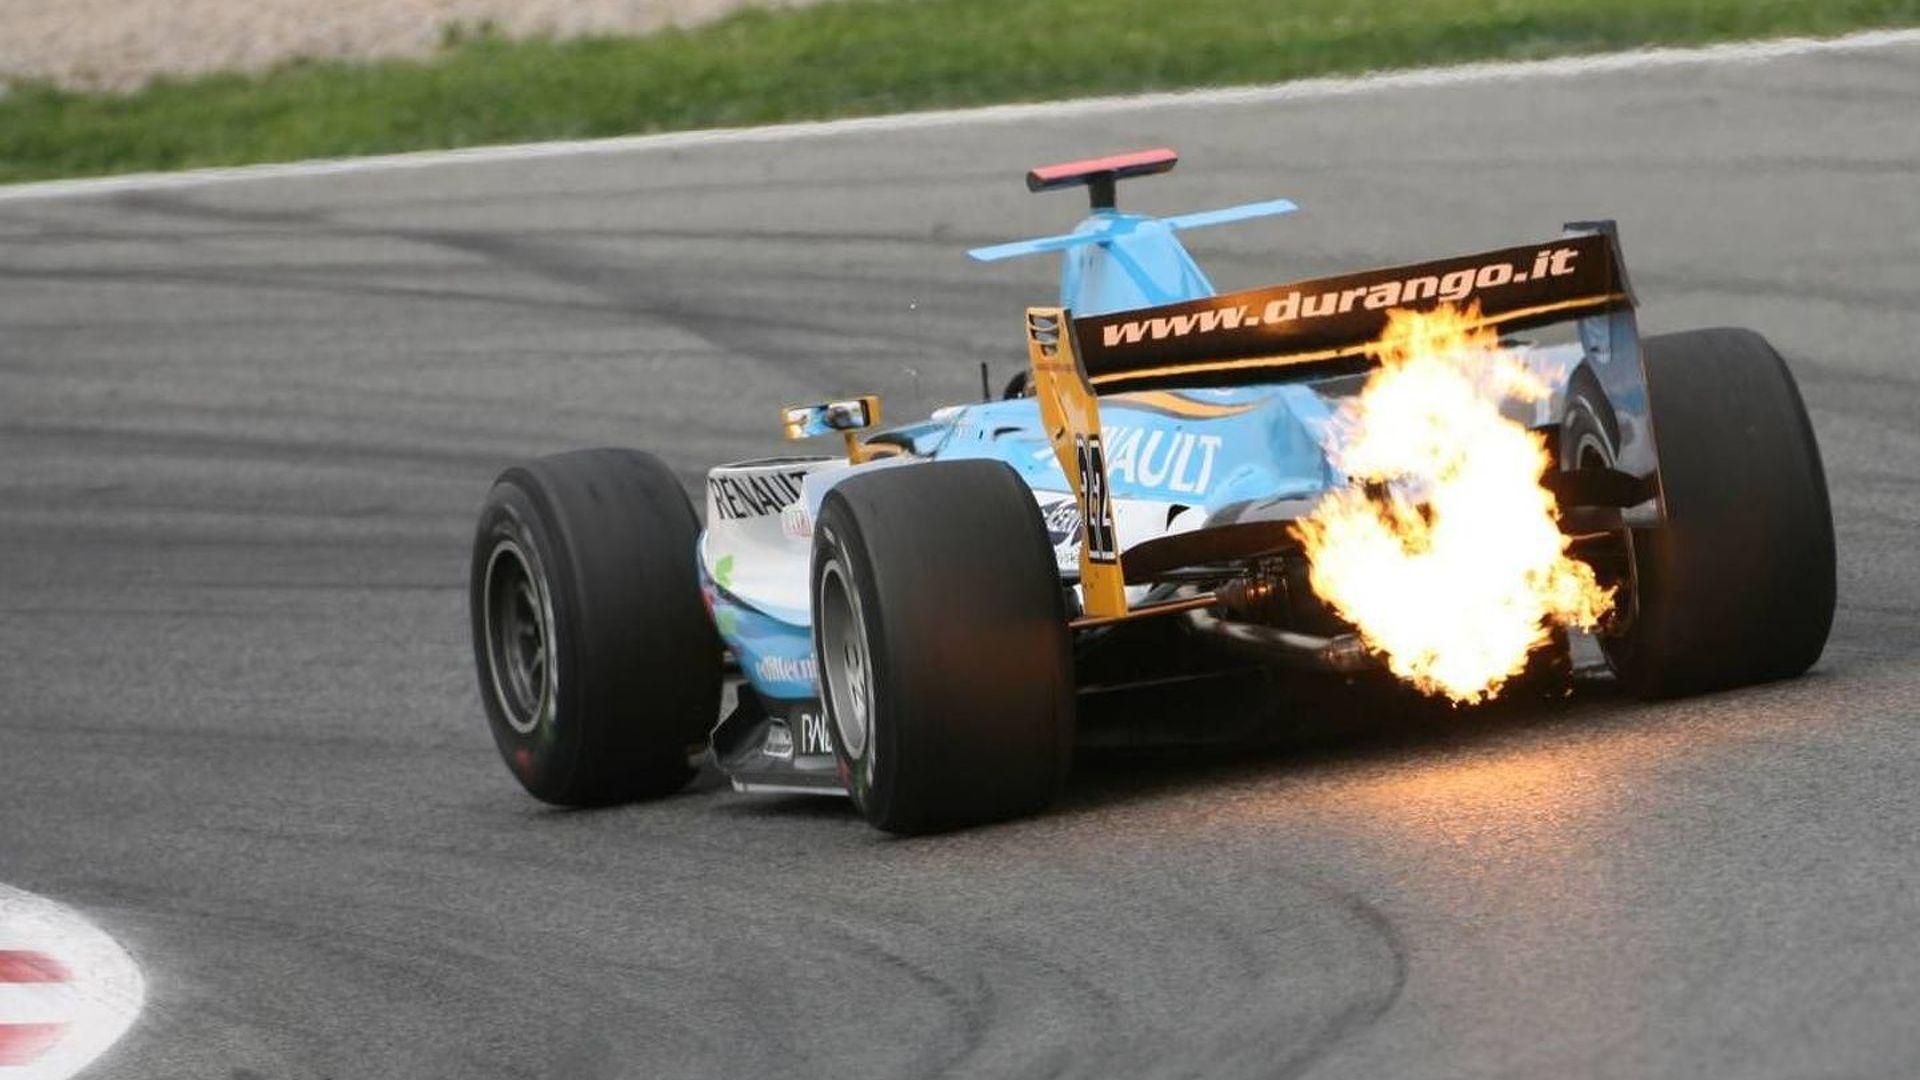 Durango admits NASCAR foray more likely than F1